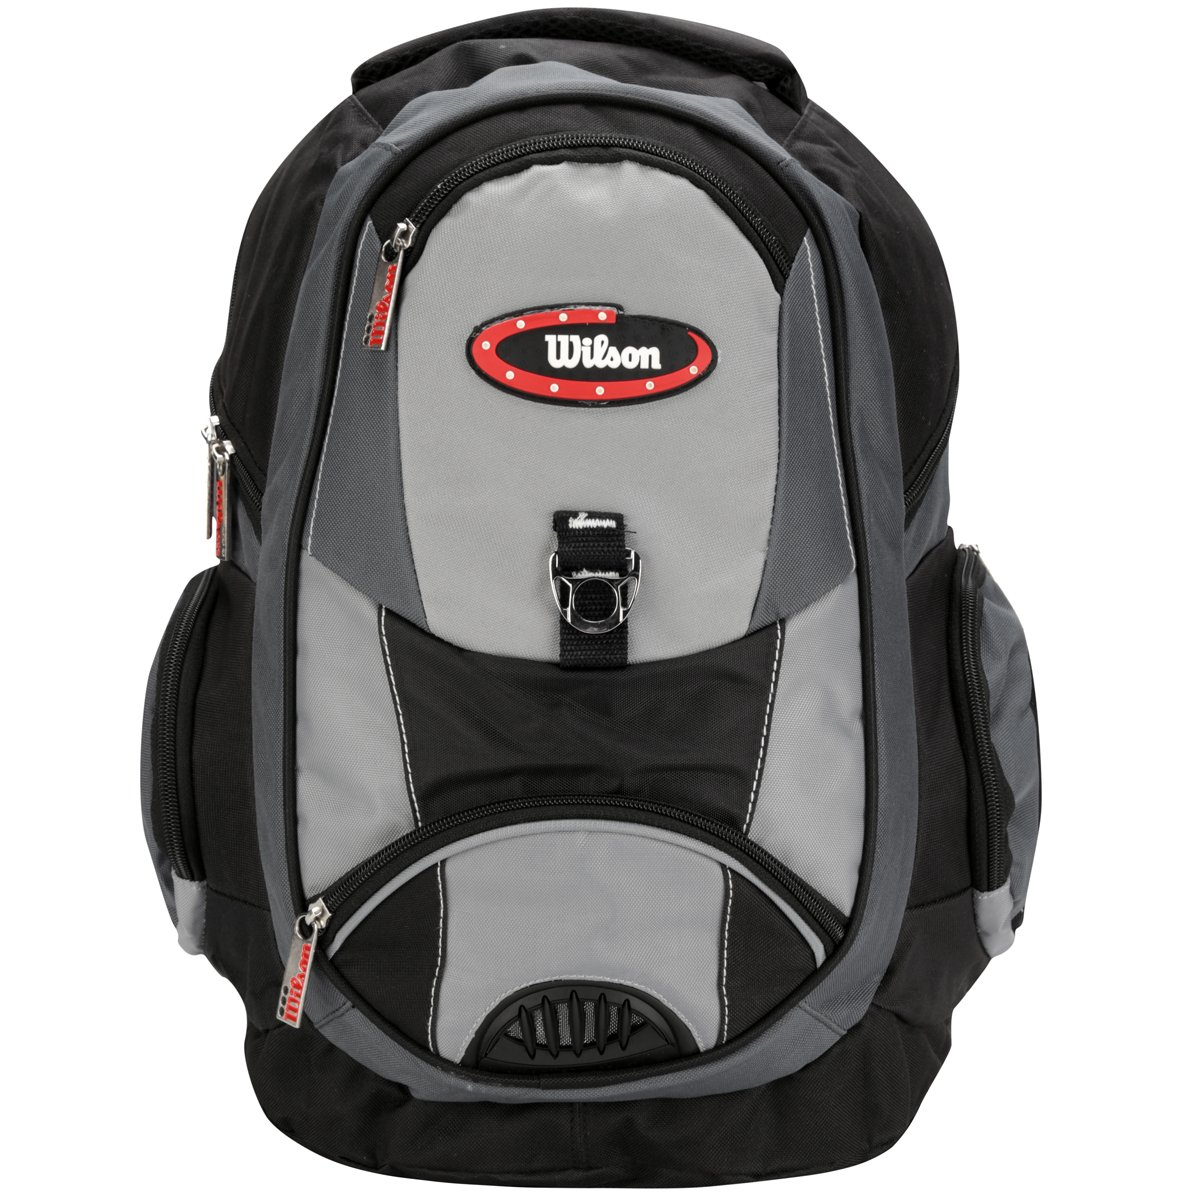 Mochila Wilson Esportiva WTIX12940C - Compre Agora  91fbe432a5a